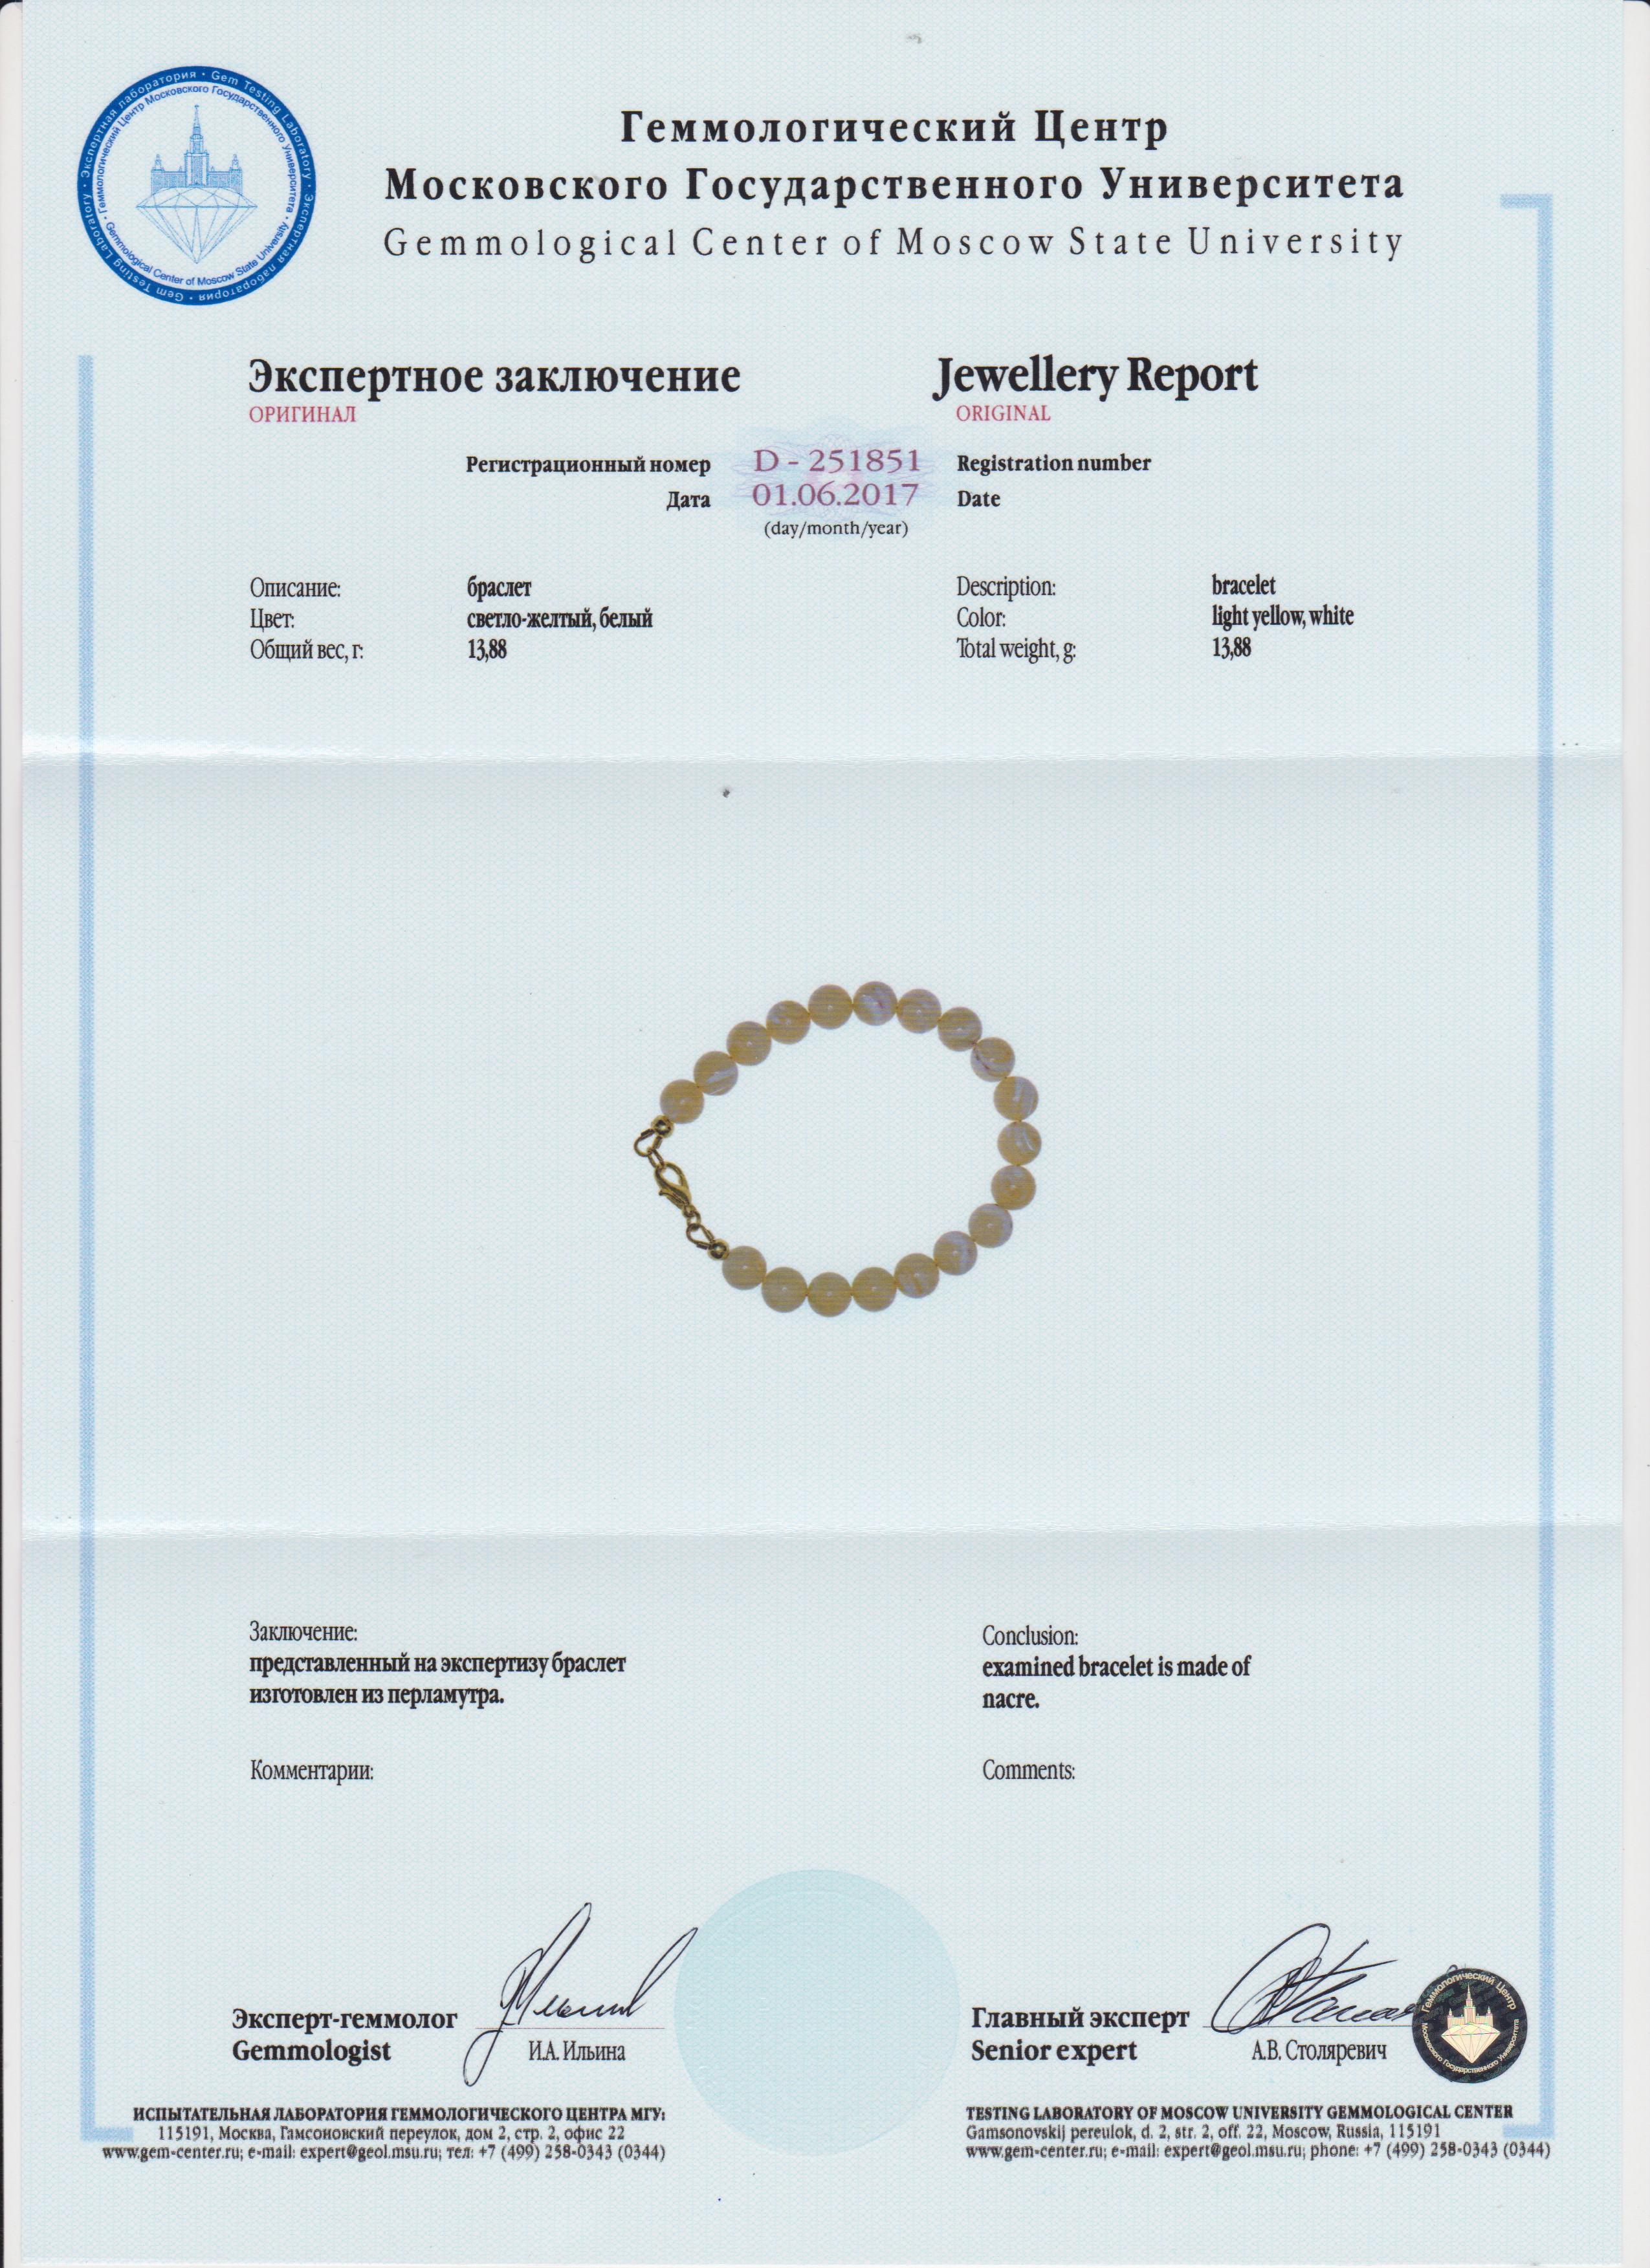 https://mineralmarket.ru/img/certificate/85/1497884784.jpg